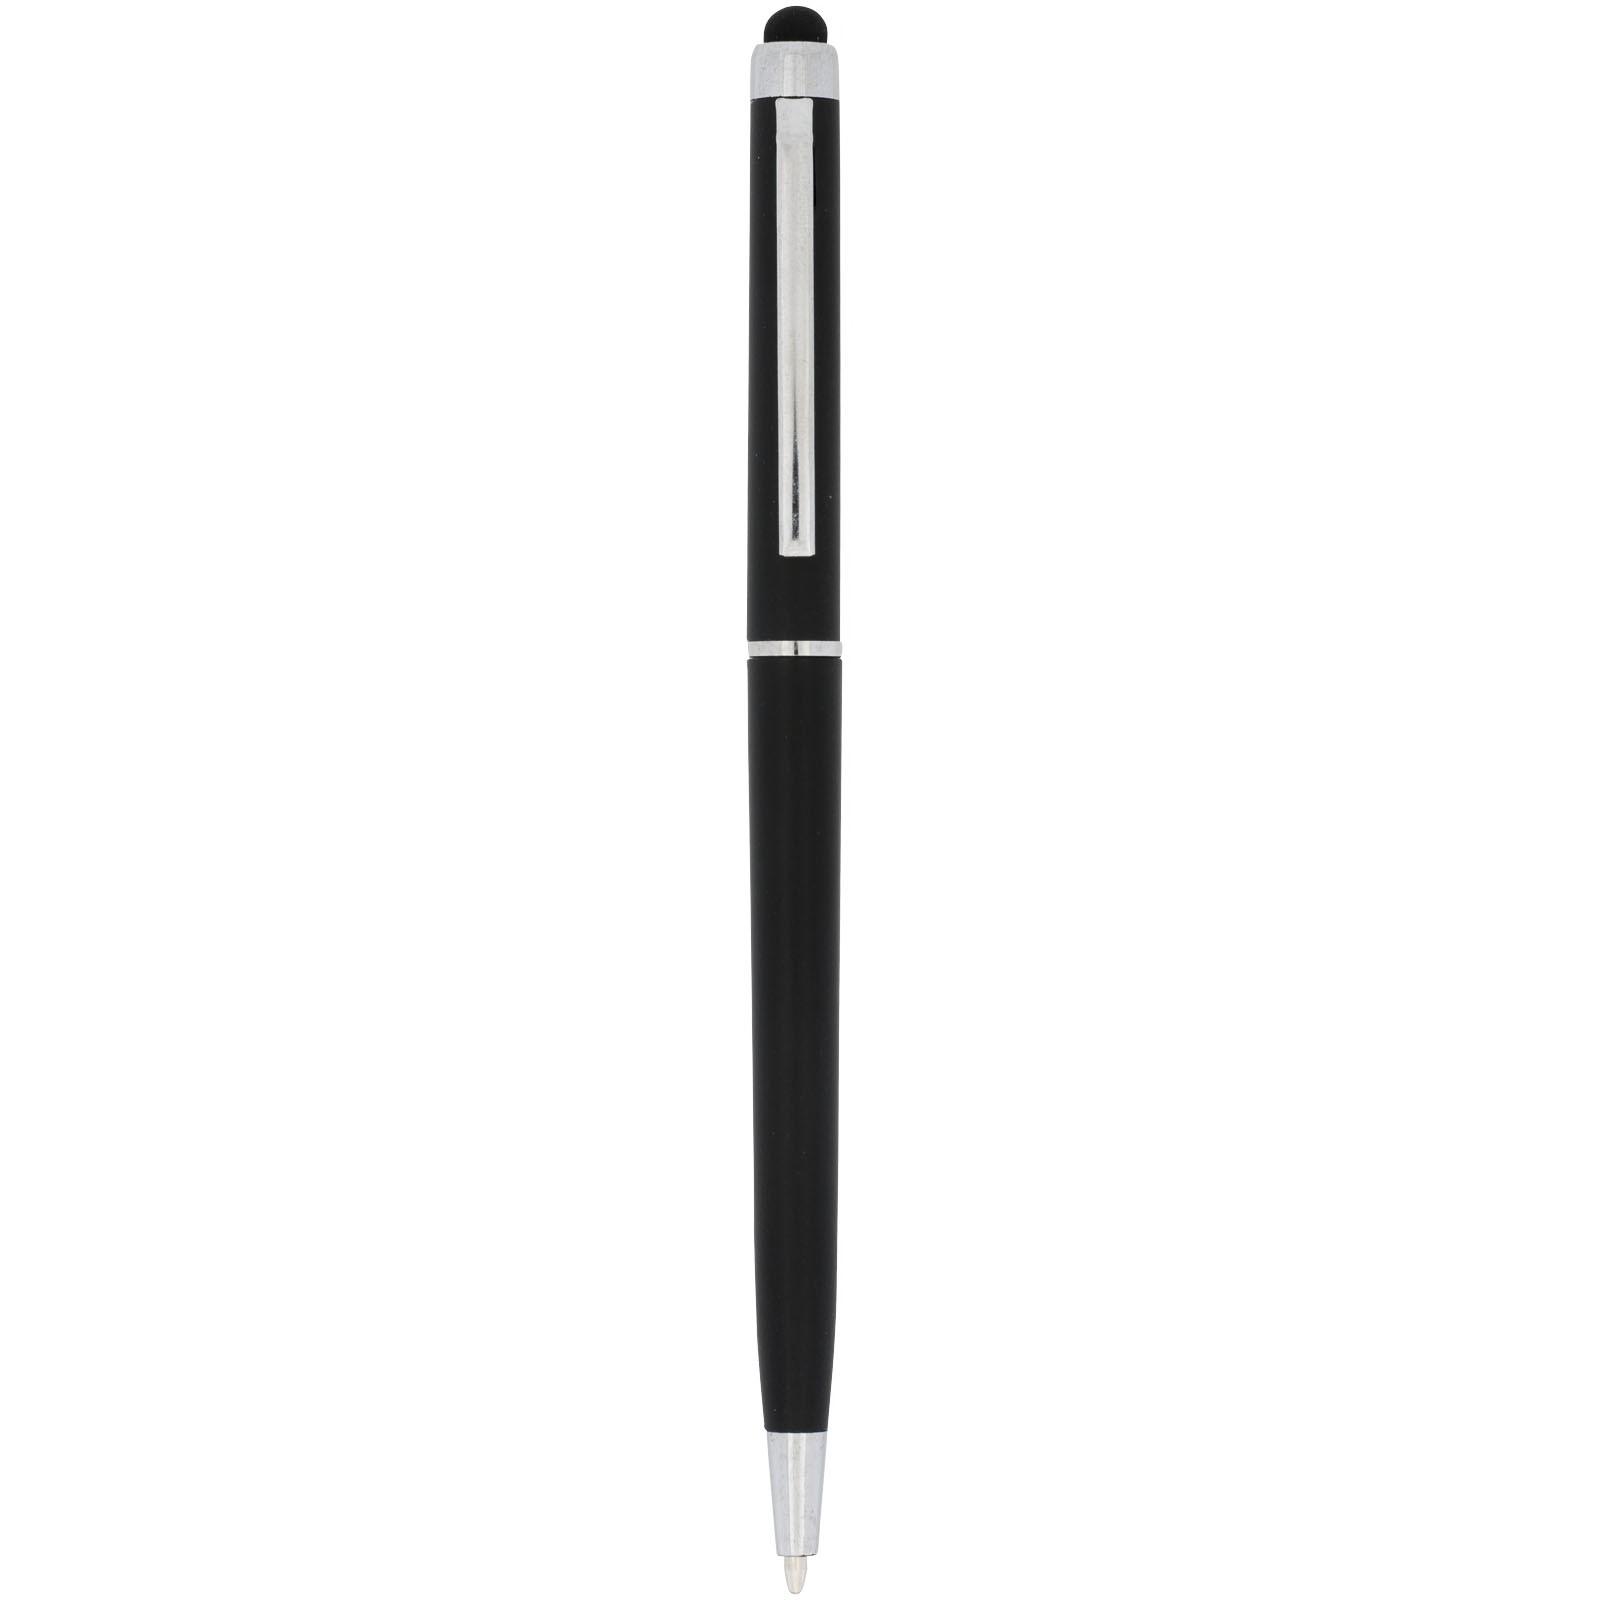 Kuličkové pero a stylus Valeria z ABS plastu - Černá